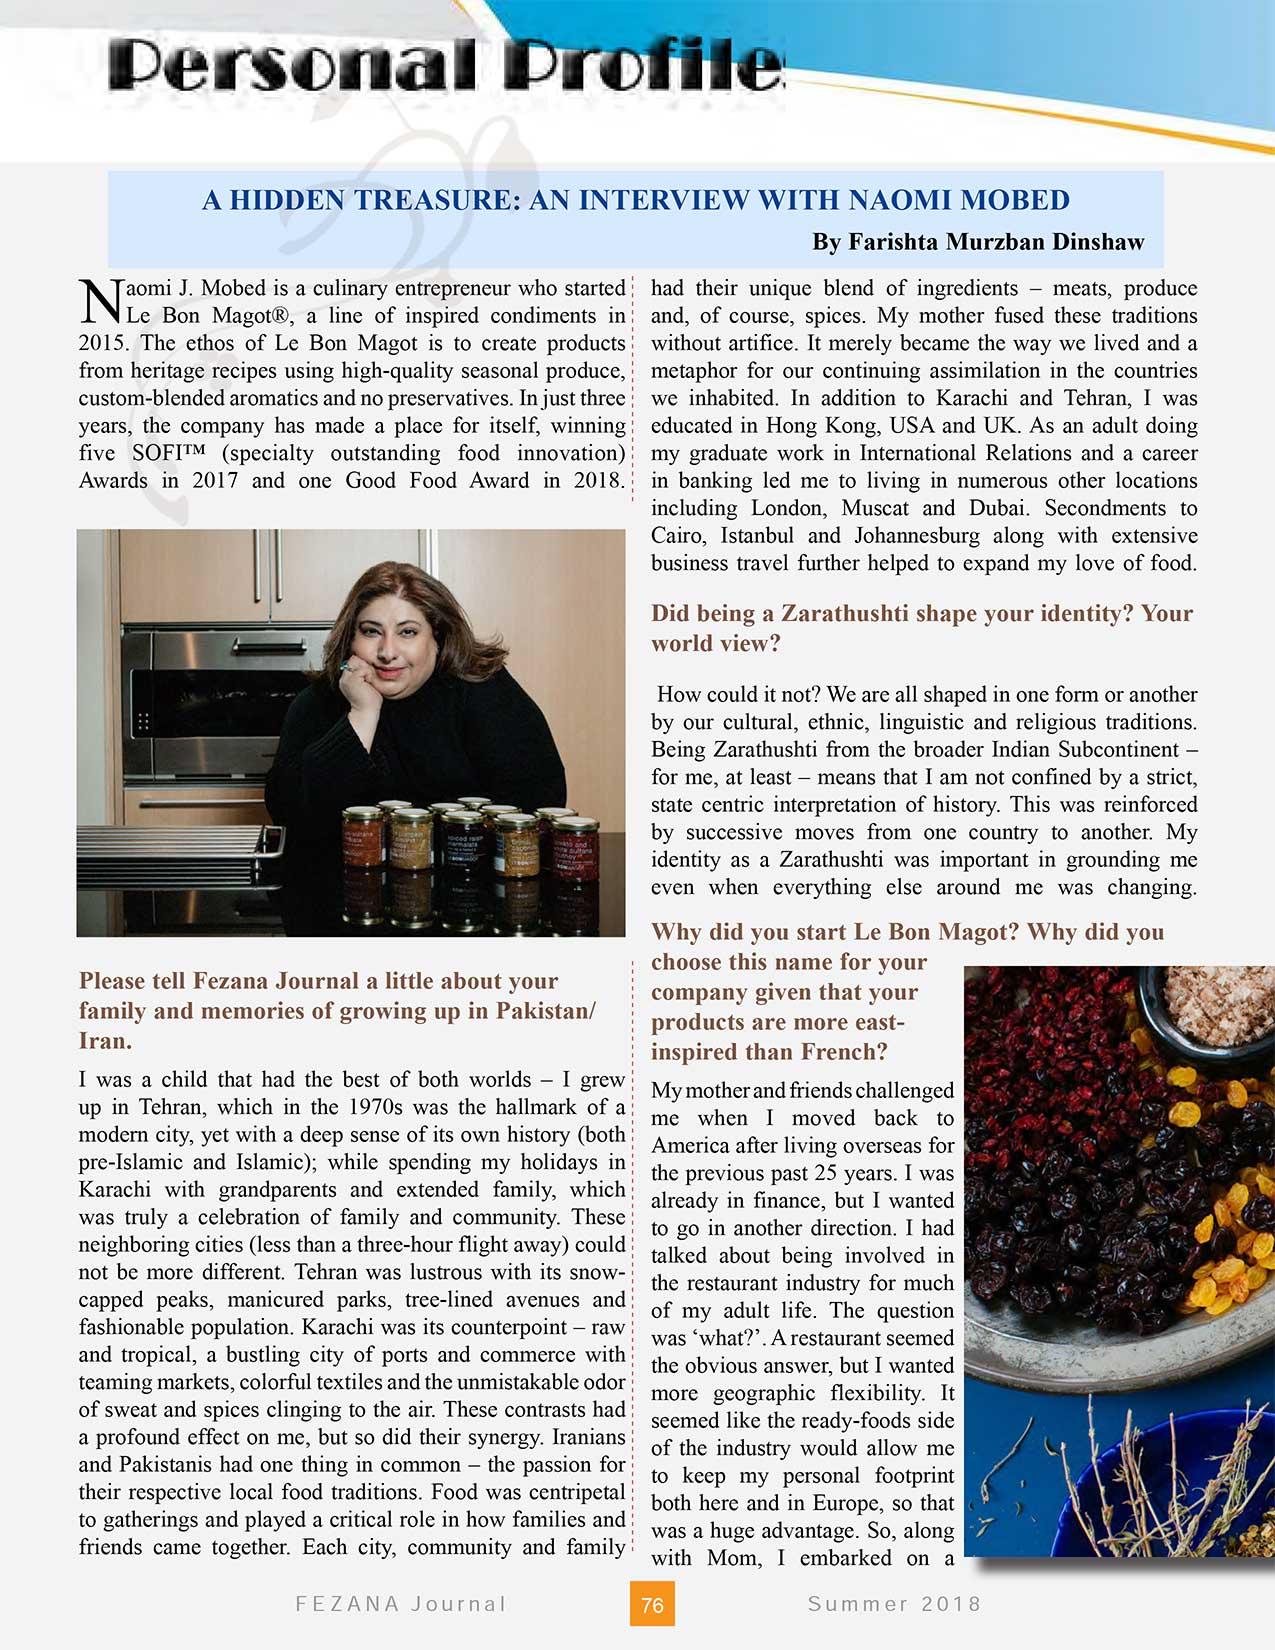 FEZANA_SUMMER-2018-page-1.jpg